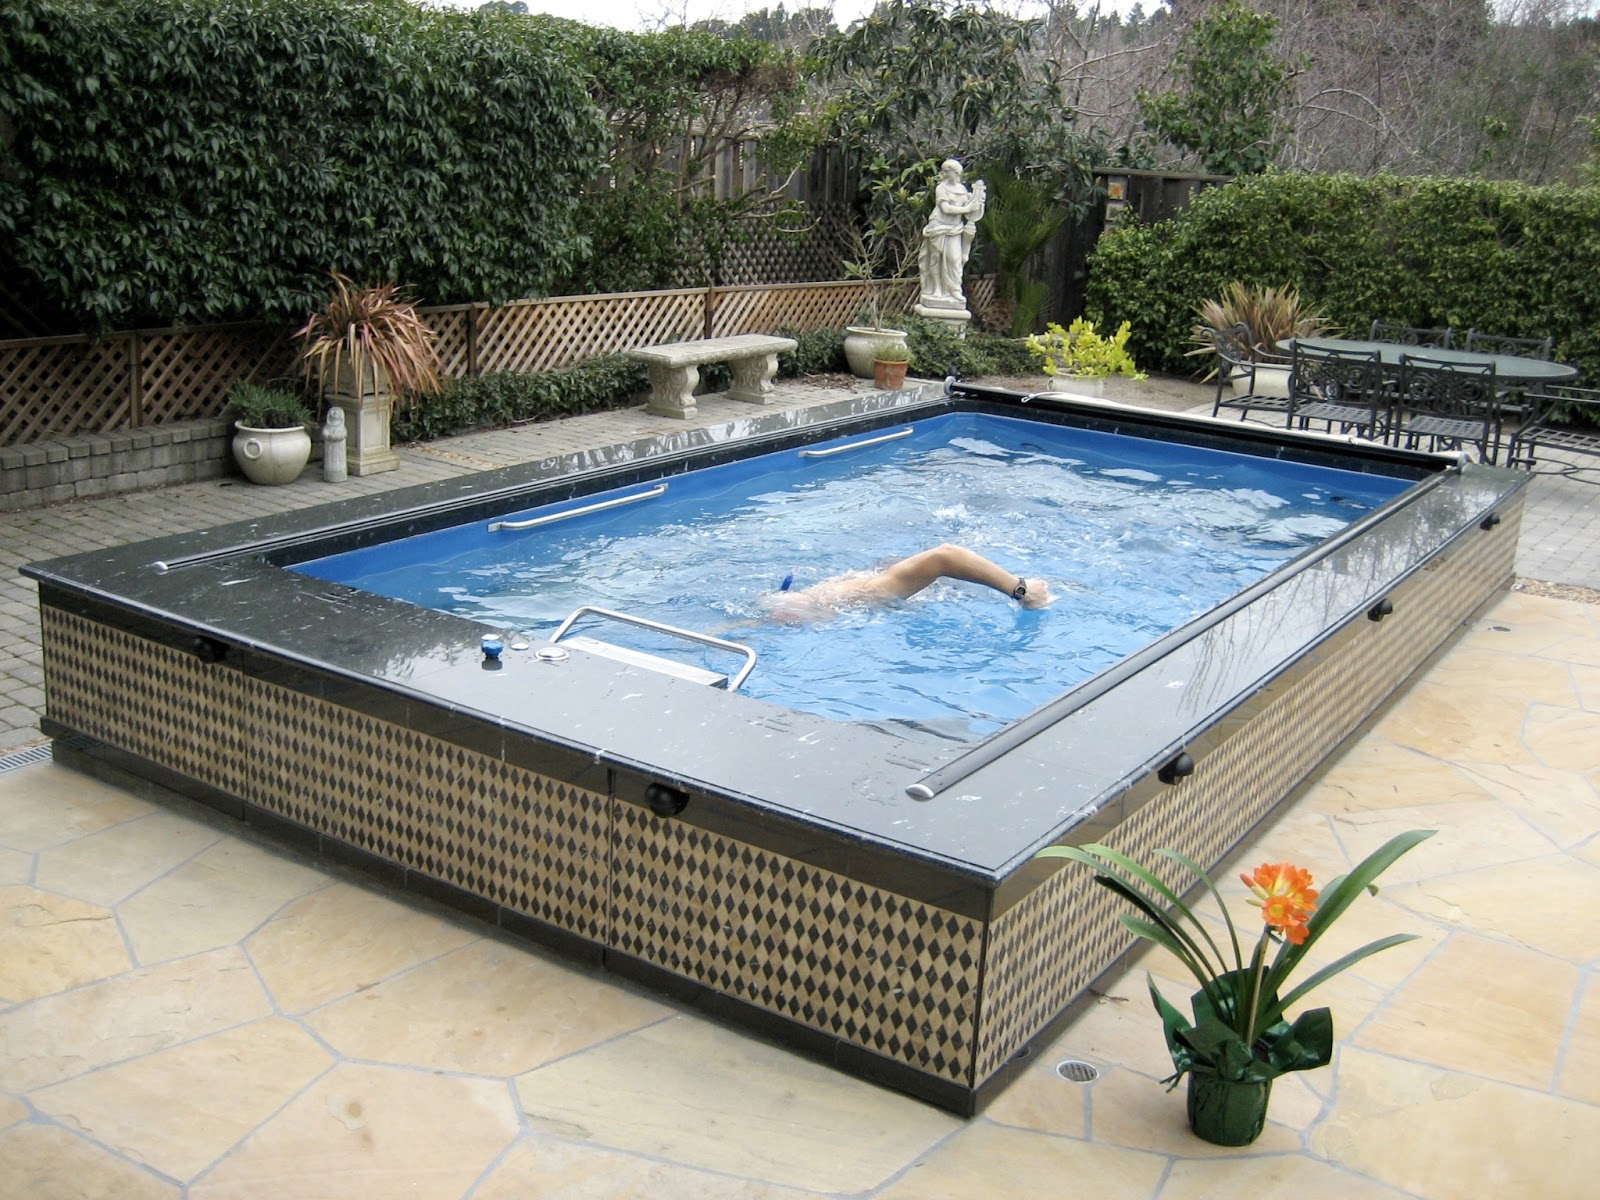 Pool Spa: Endless Pool Spa Cost